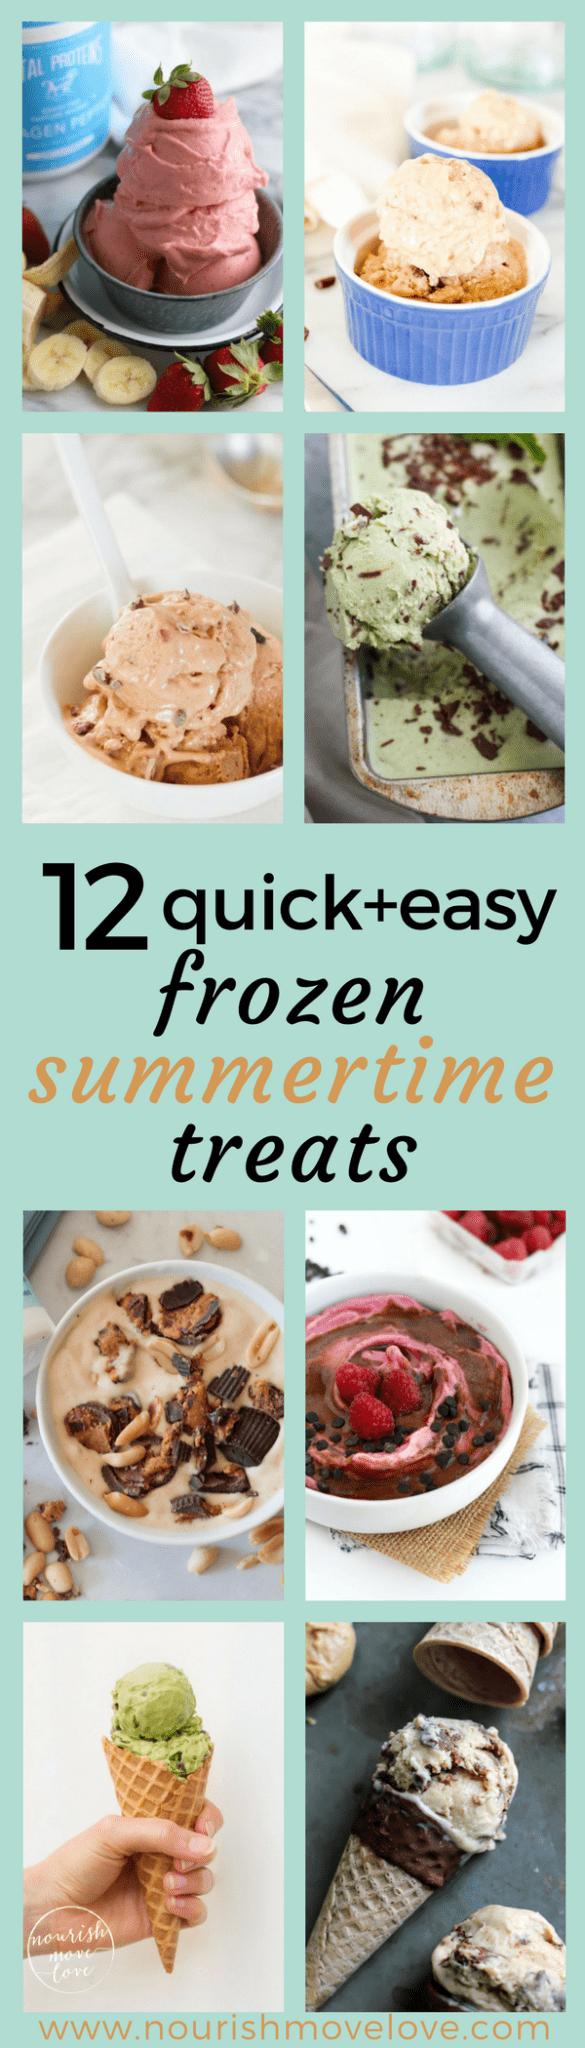 12 quick + easy frozen summertime desserts | www.nourishmovelove.com